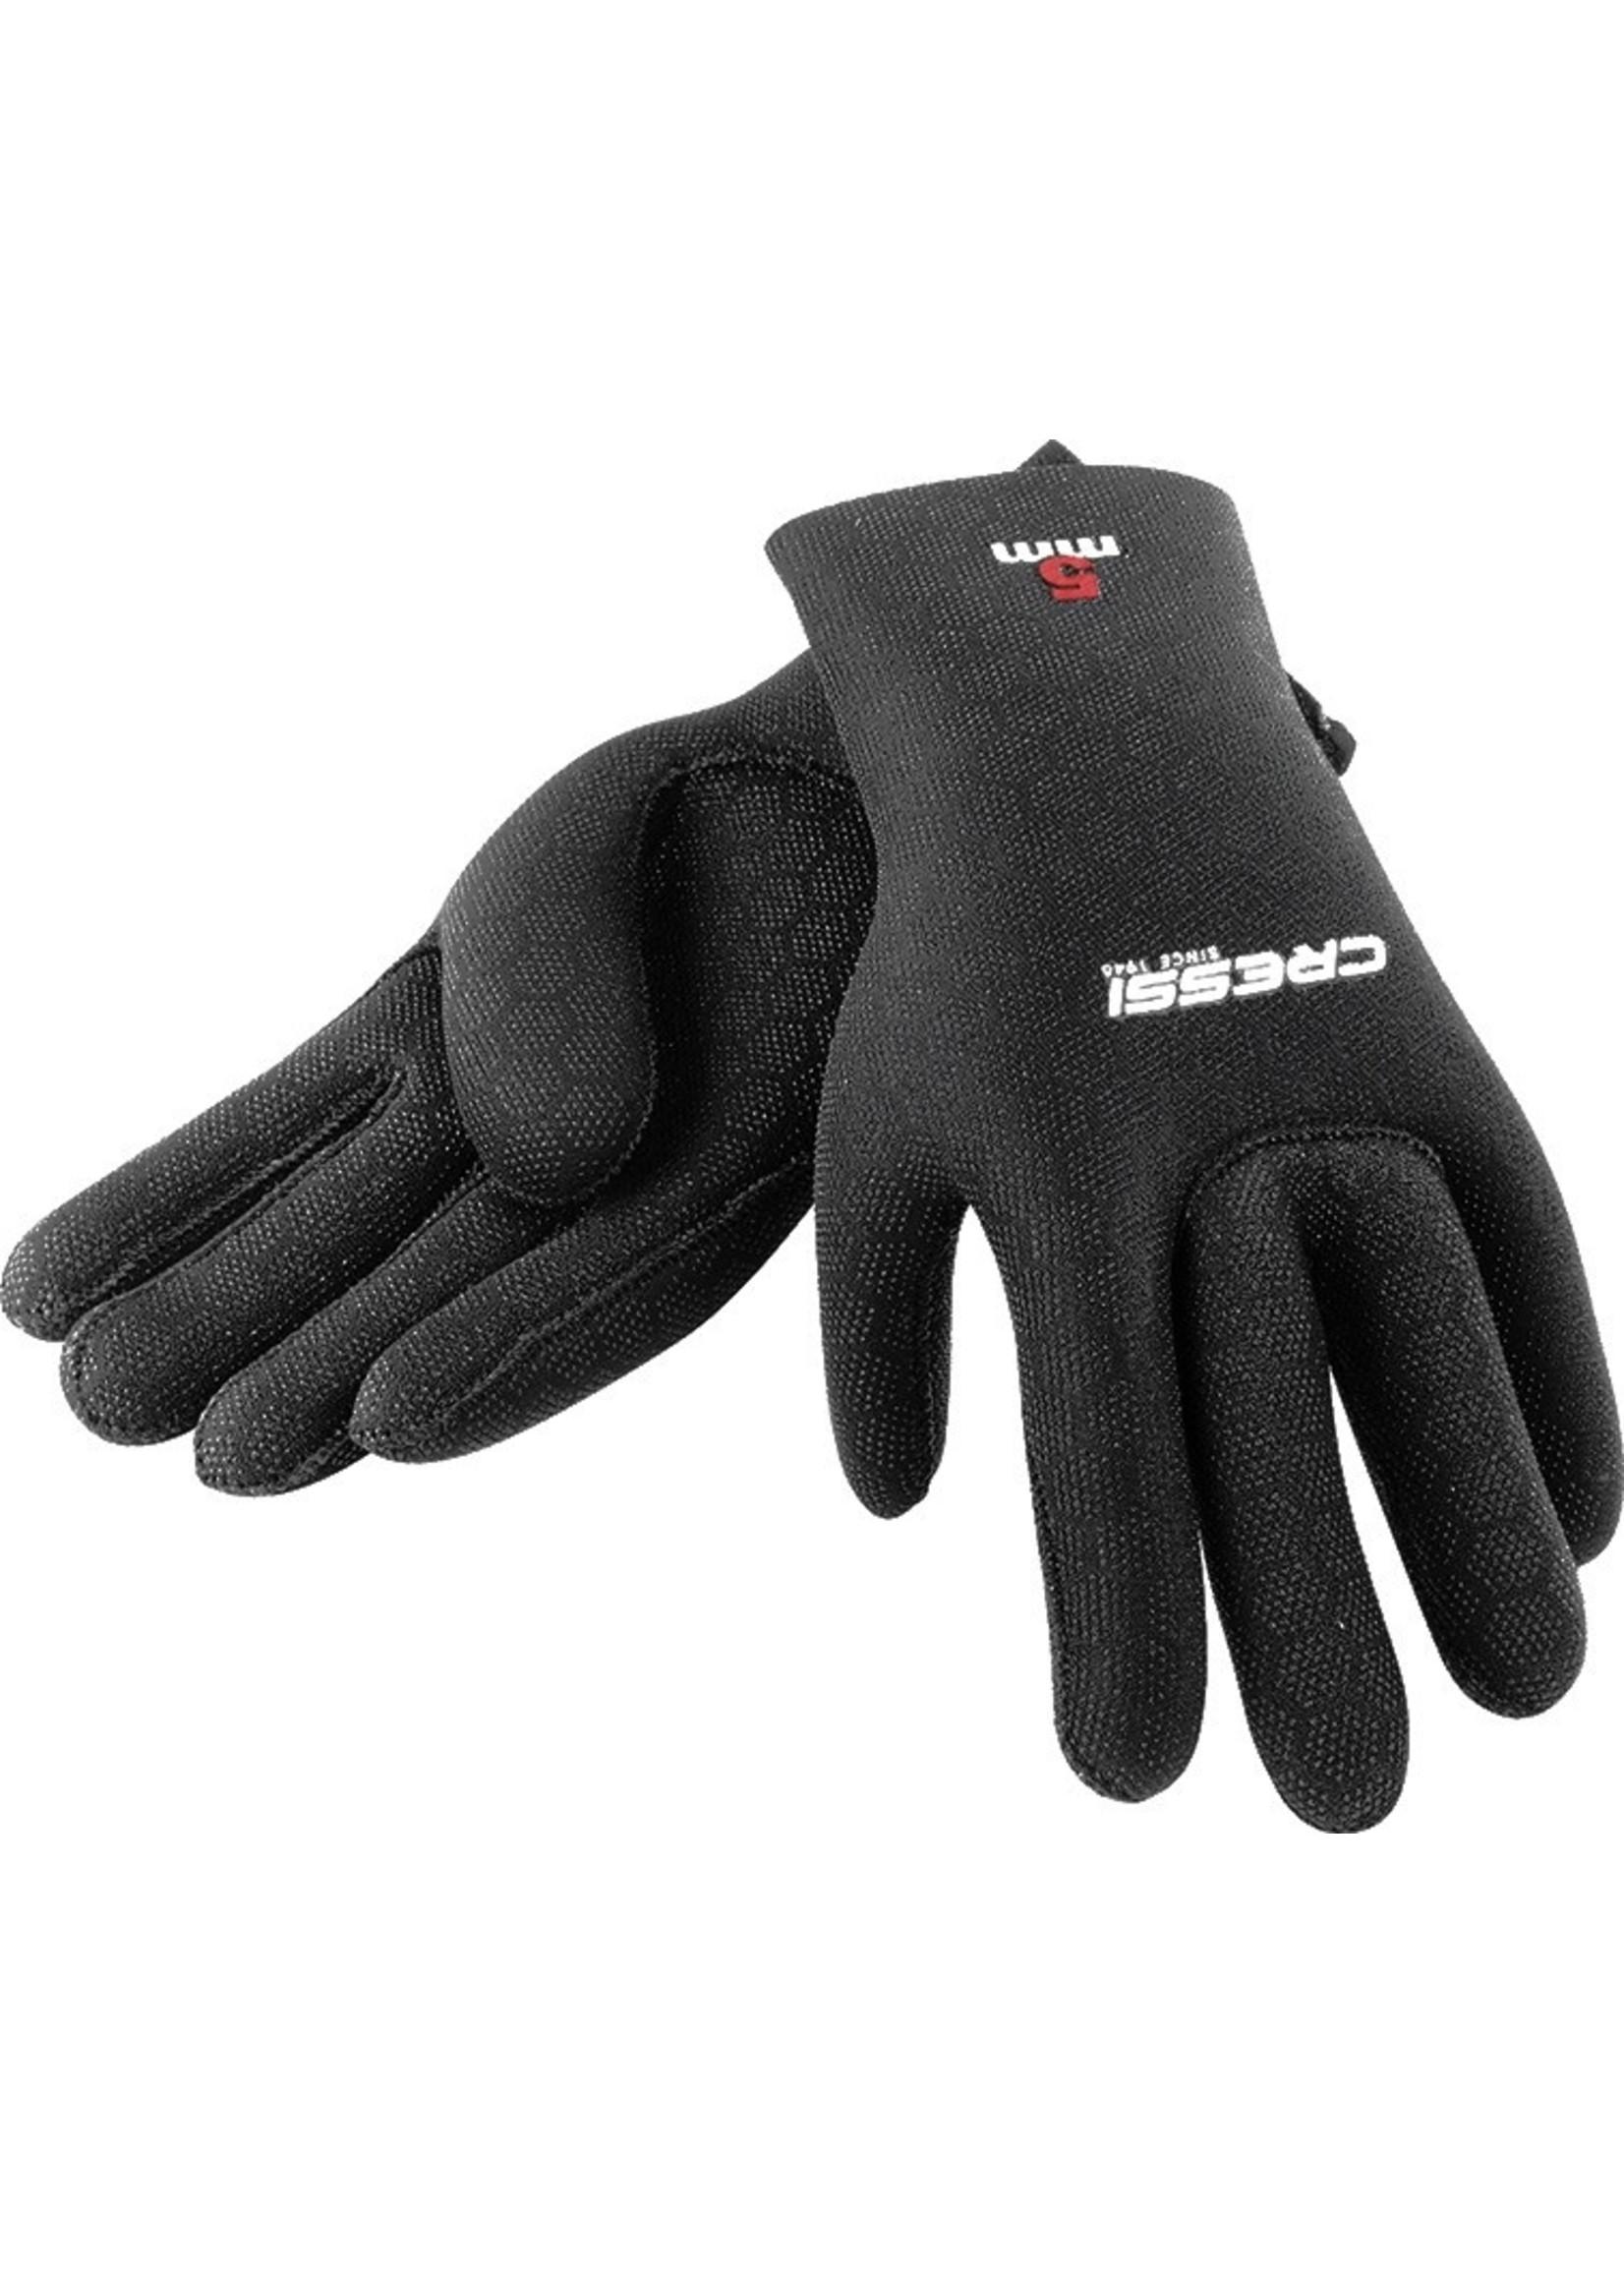 Cressi Cressi High Stretch Handschoenen 3.5mm